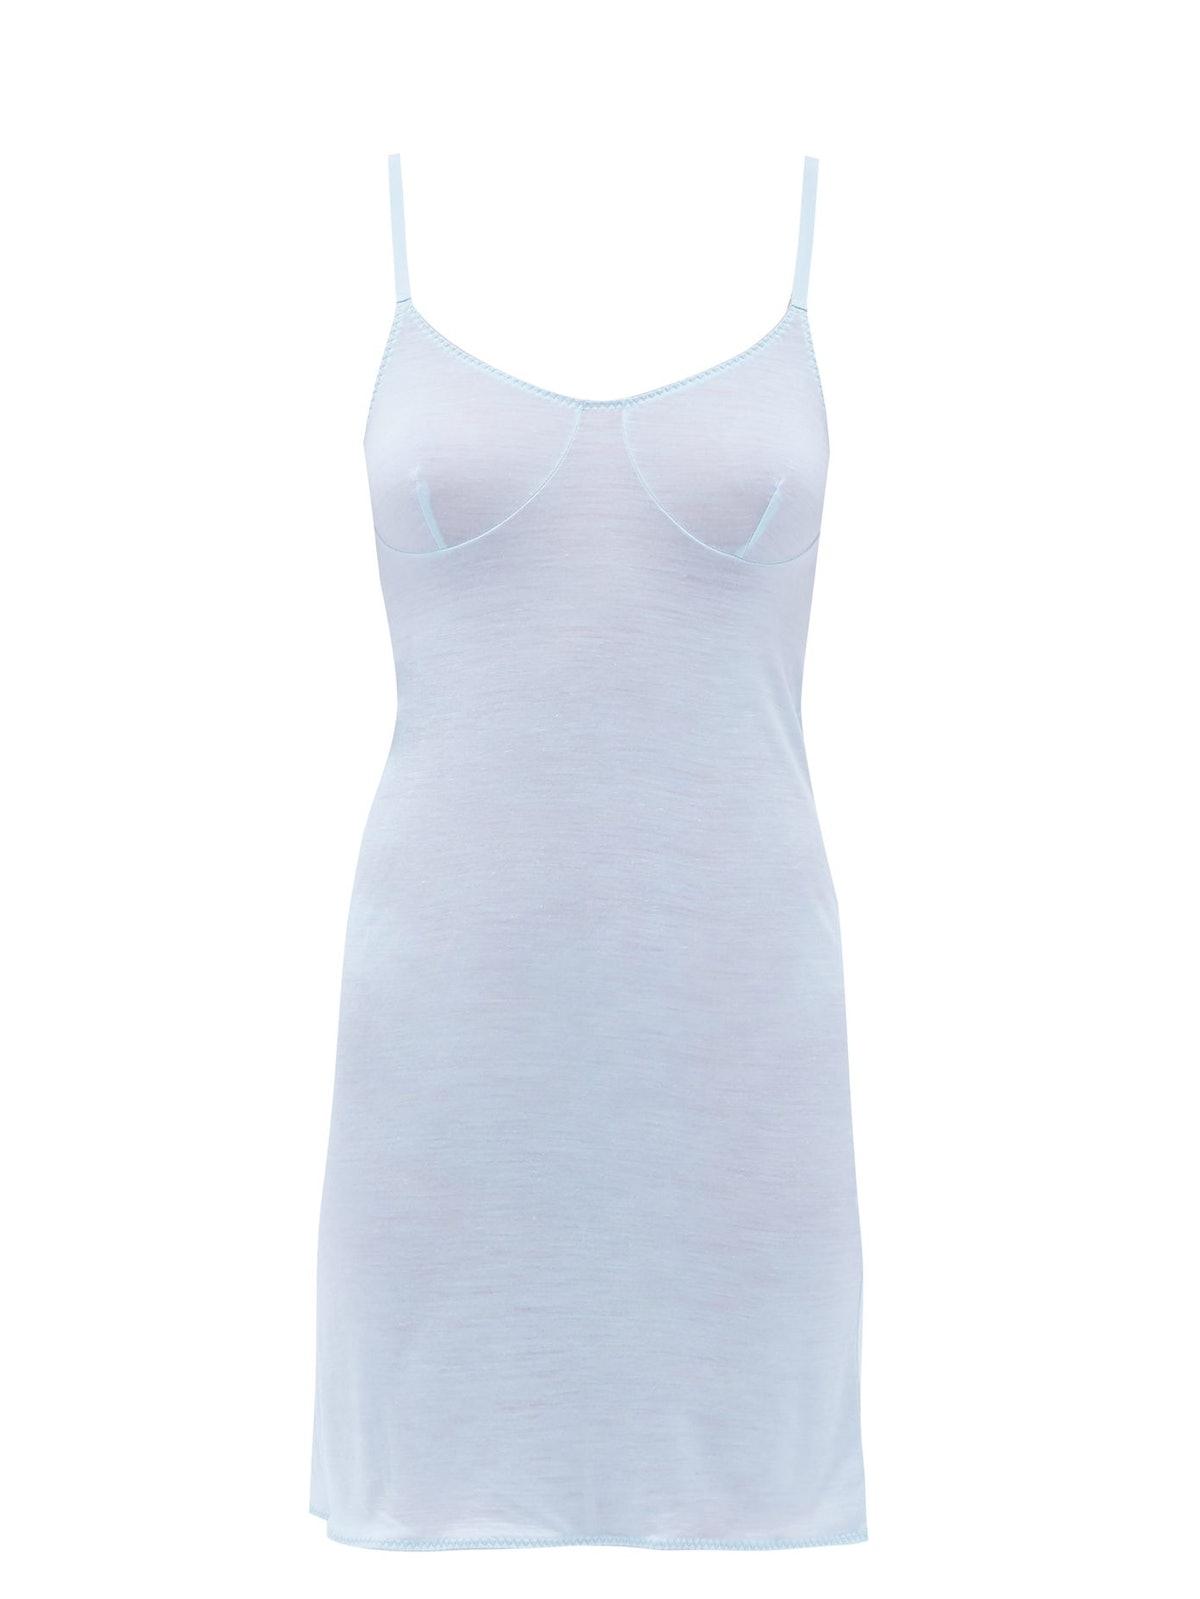 Burtas Adjustable-Strap Slip Dress